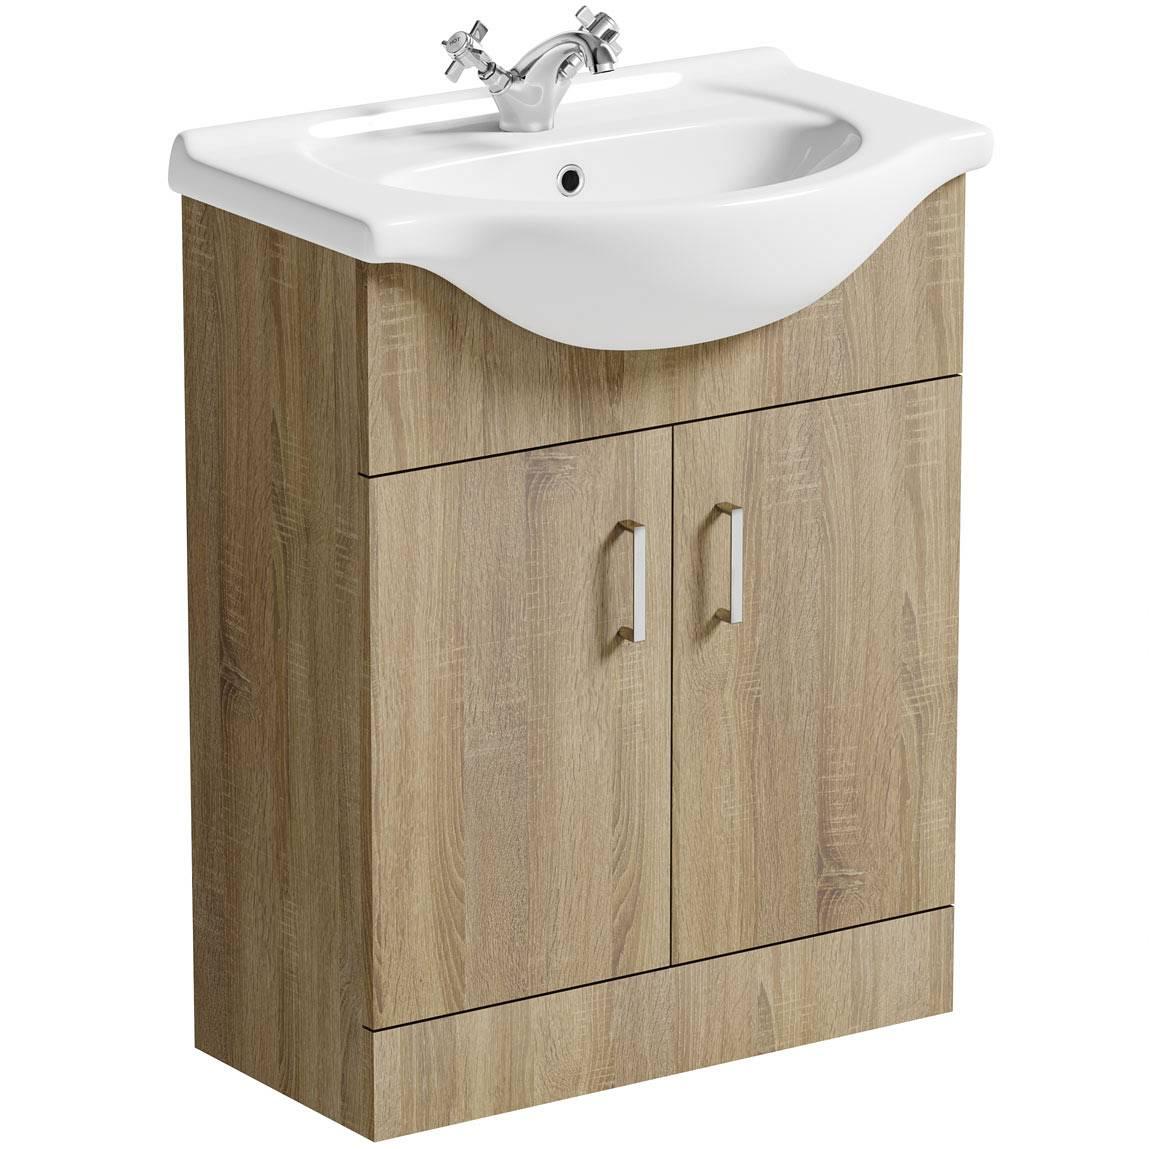 Image of Sienna Oak 65 Vanity Unit & Basin